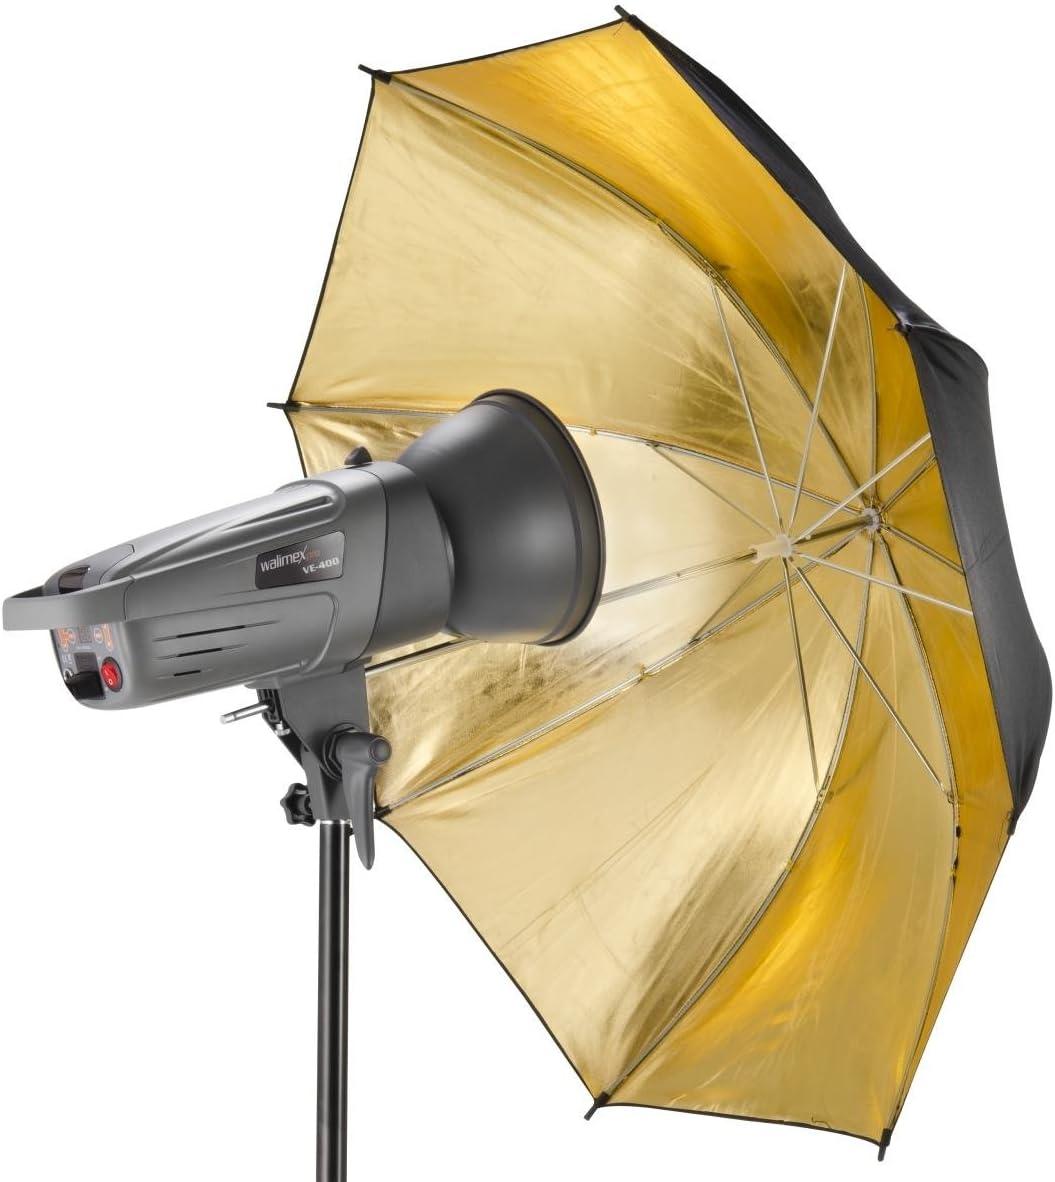 Walimex Reflexschirm Gold Kamera